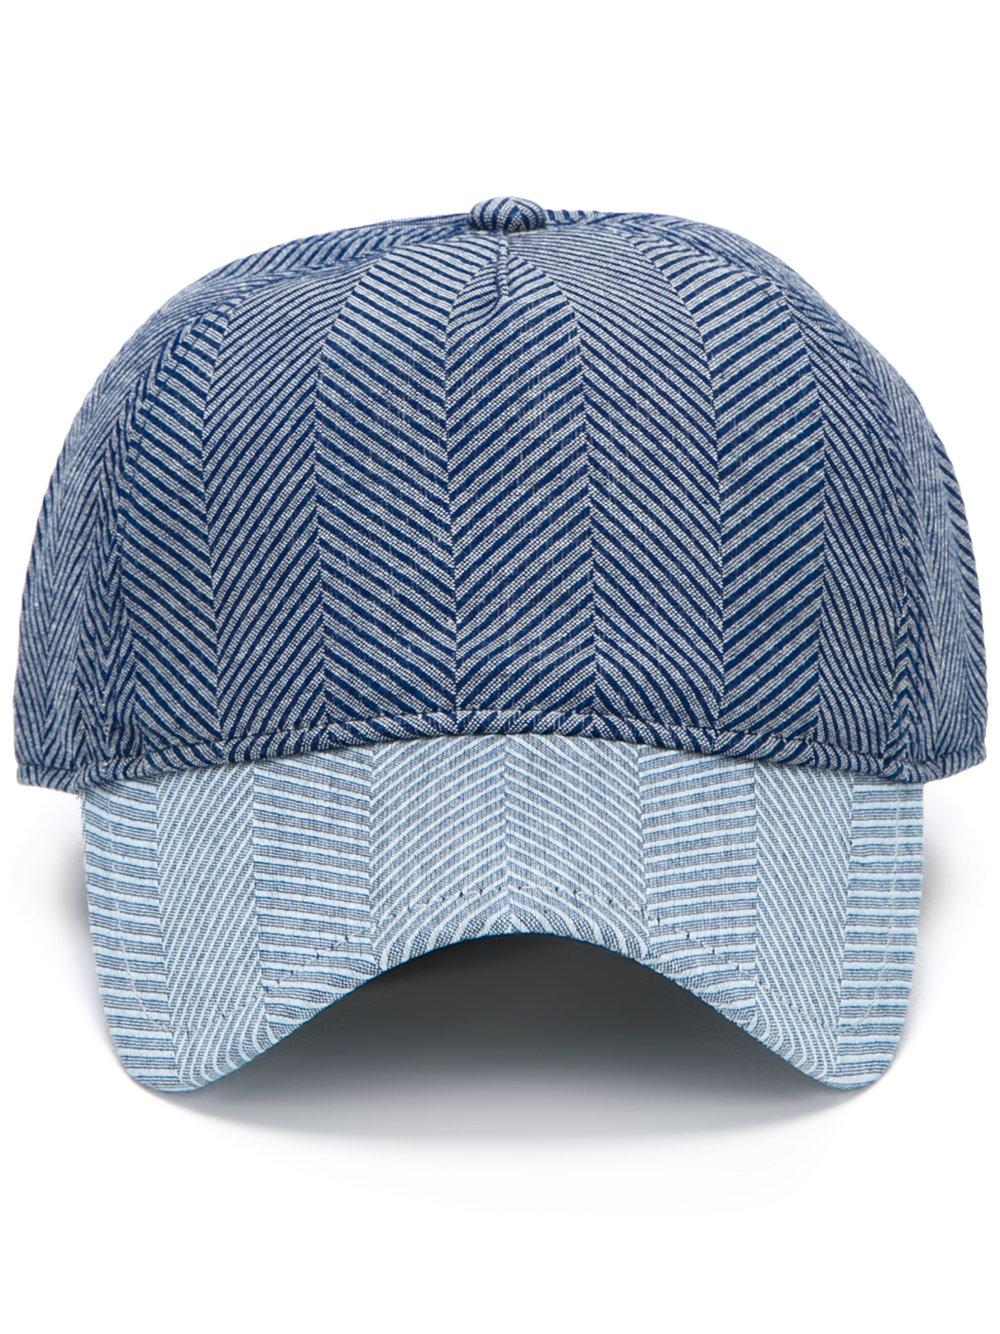 1283917af9a Rag   Bone Striped Bars Cap in Blue for Men - Lyst